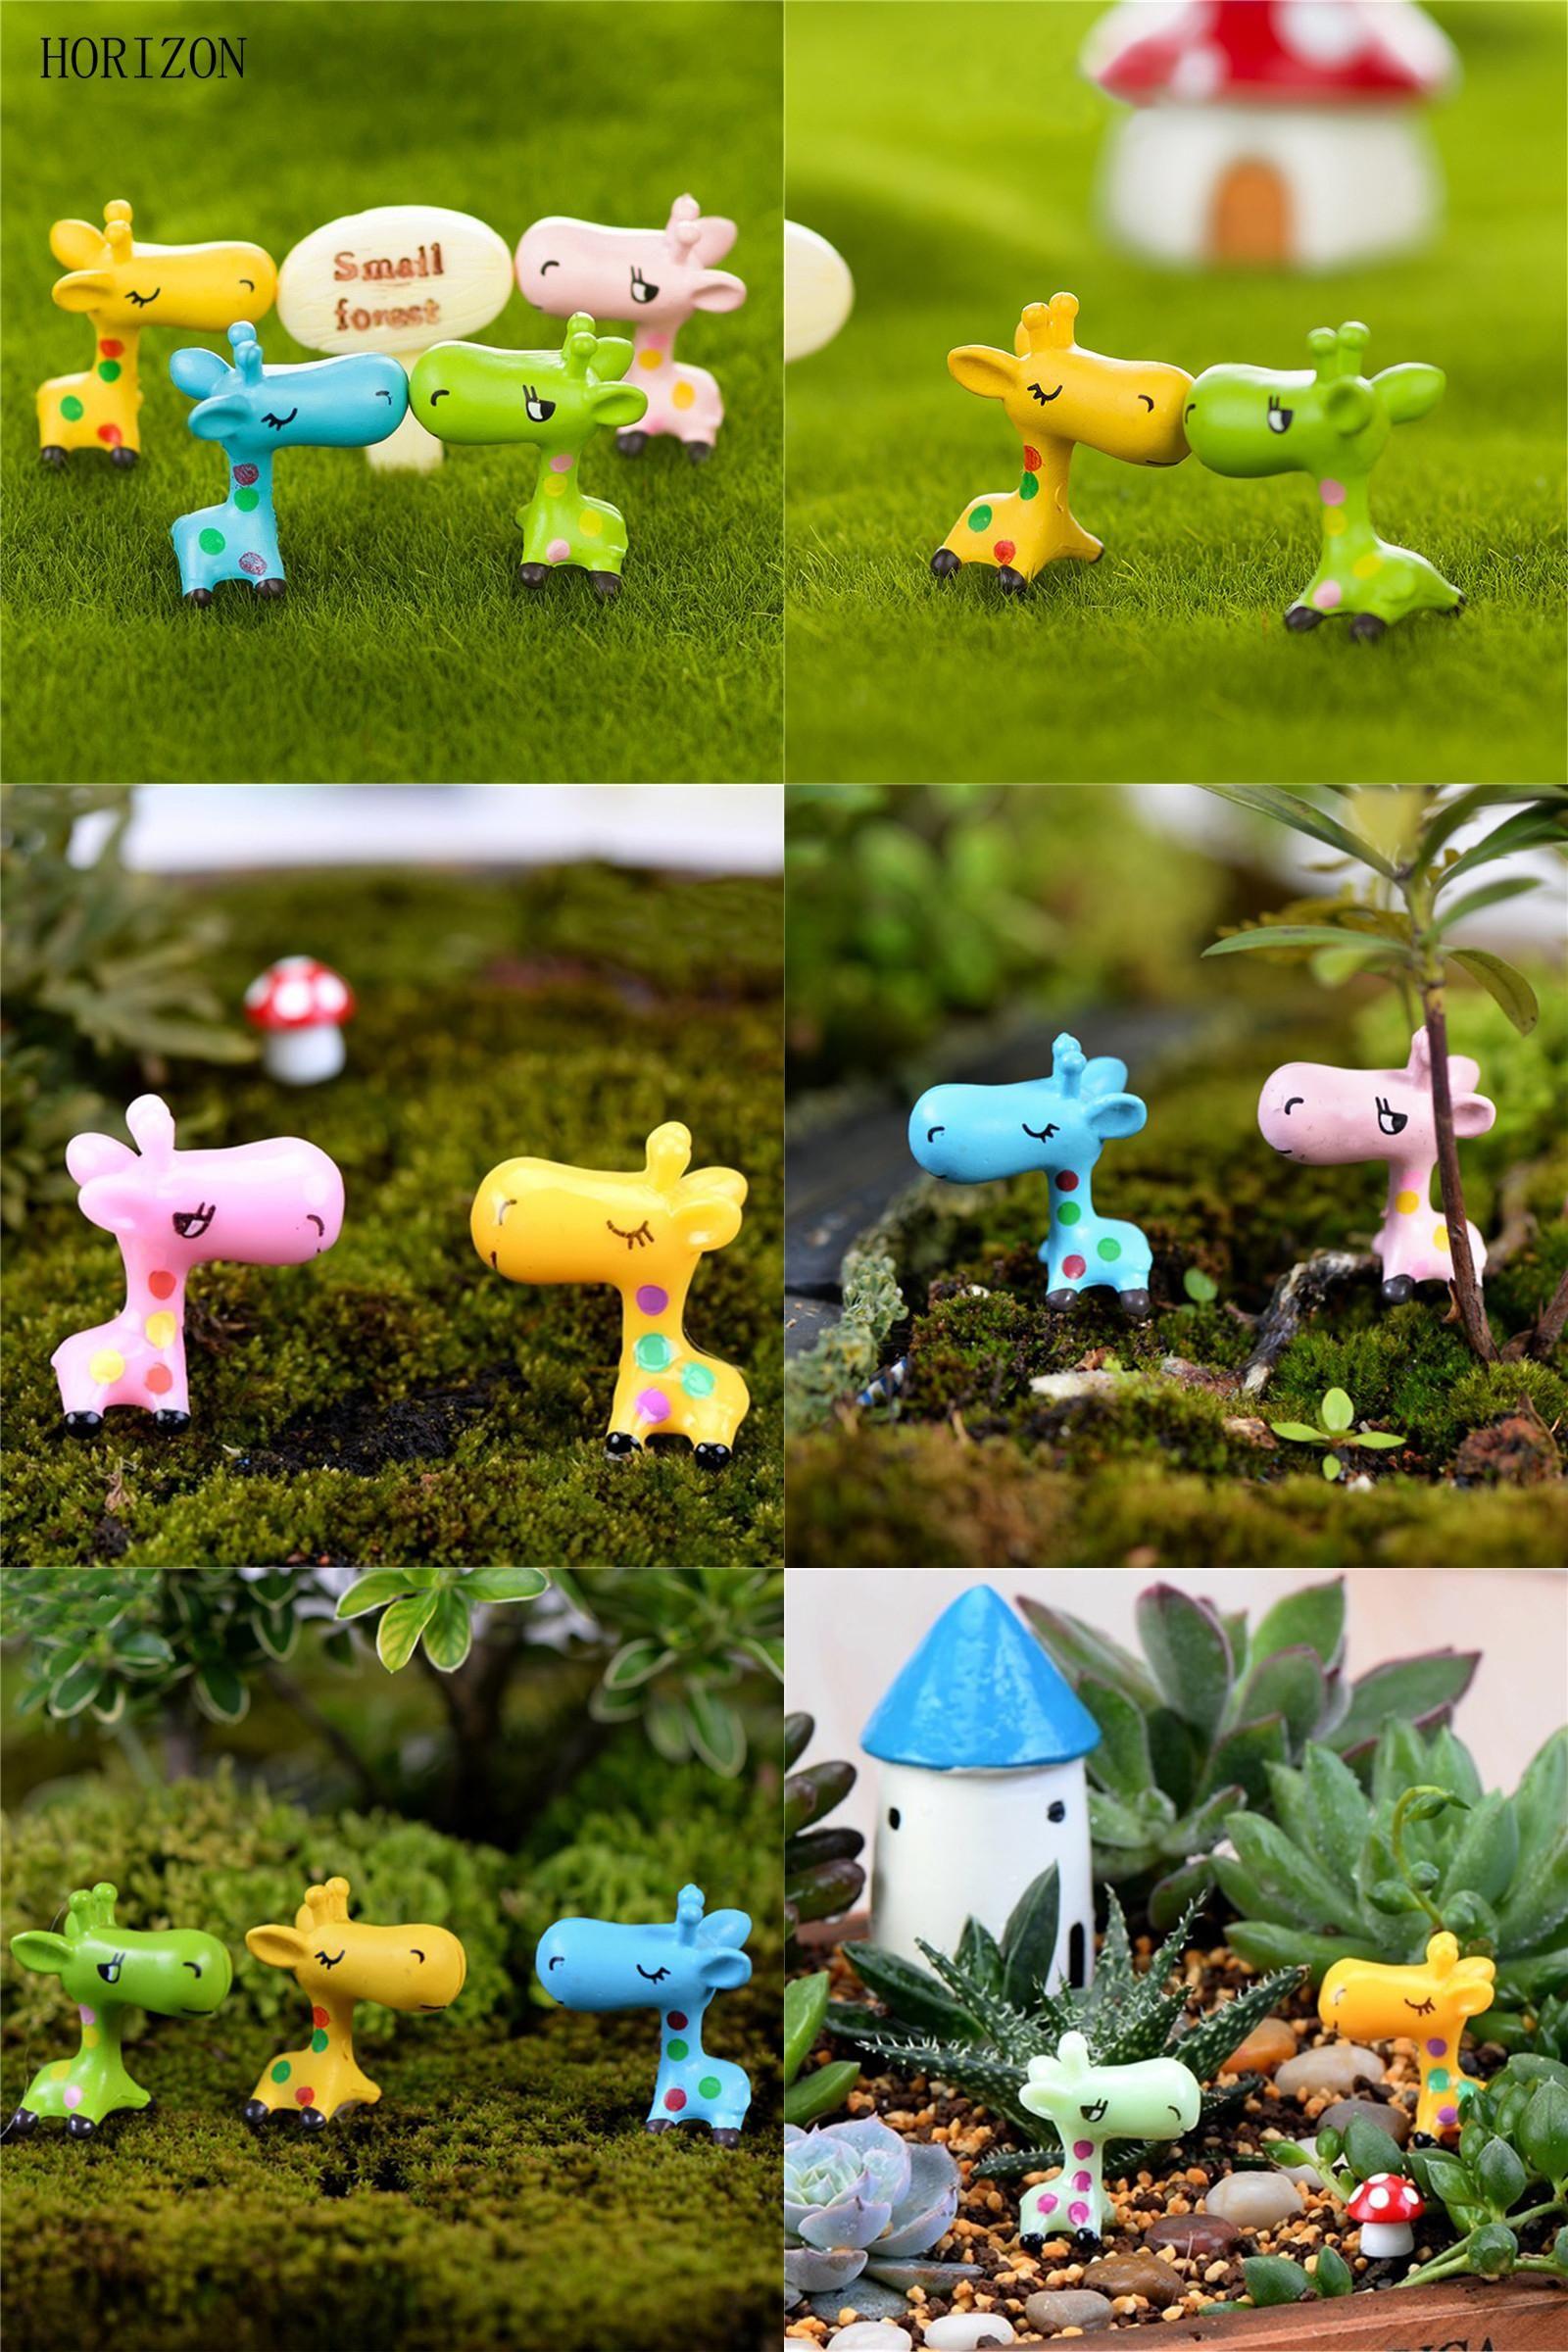 Fairy Dollhouse Miniature Animals Figurine Garden Ornament Plant Pot Bonsai DIY